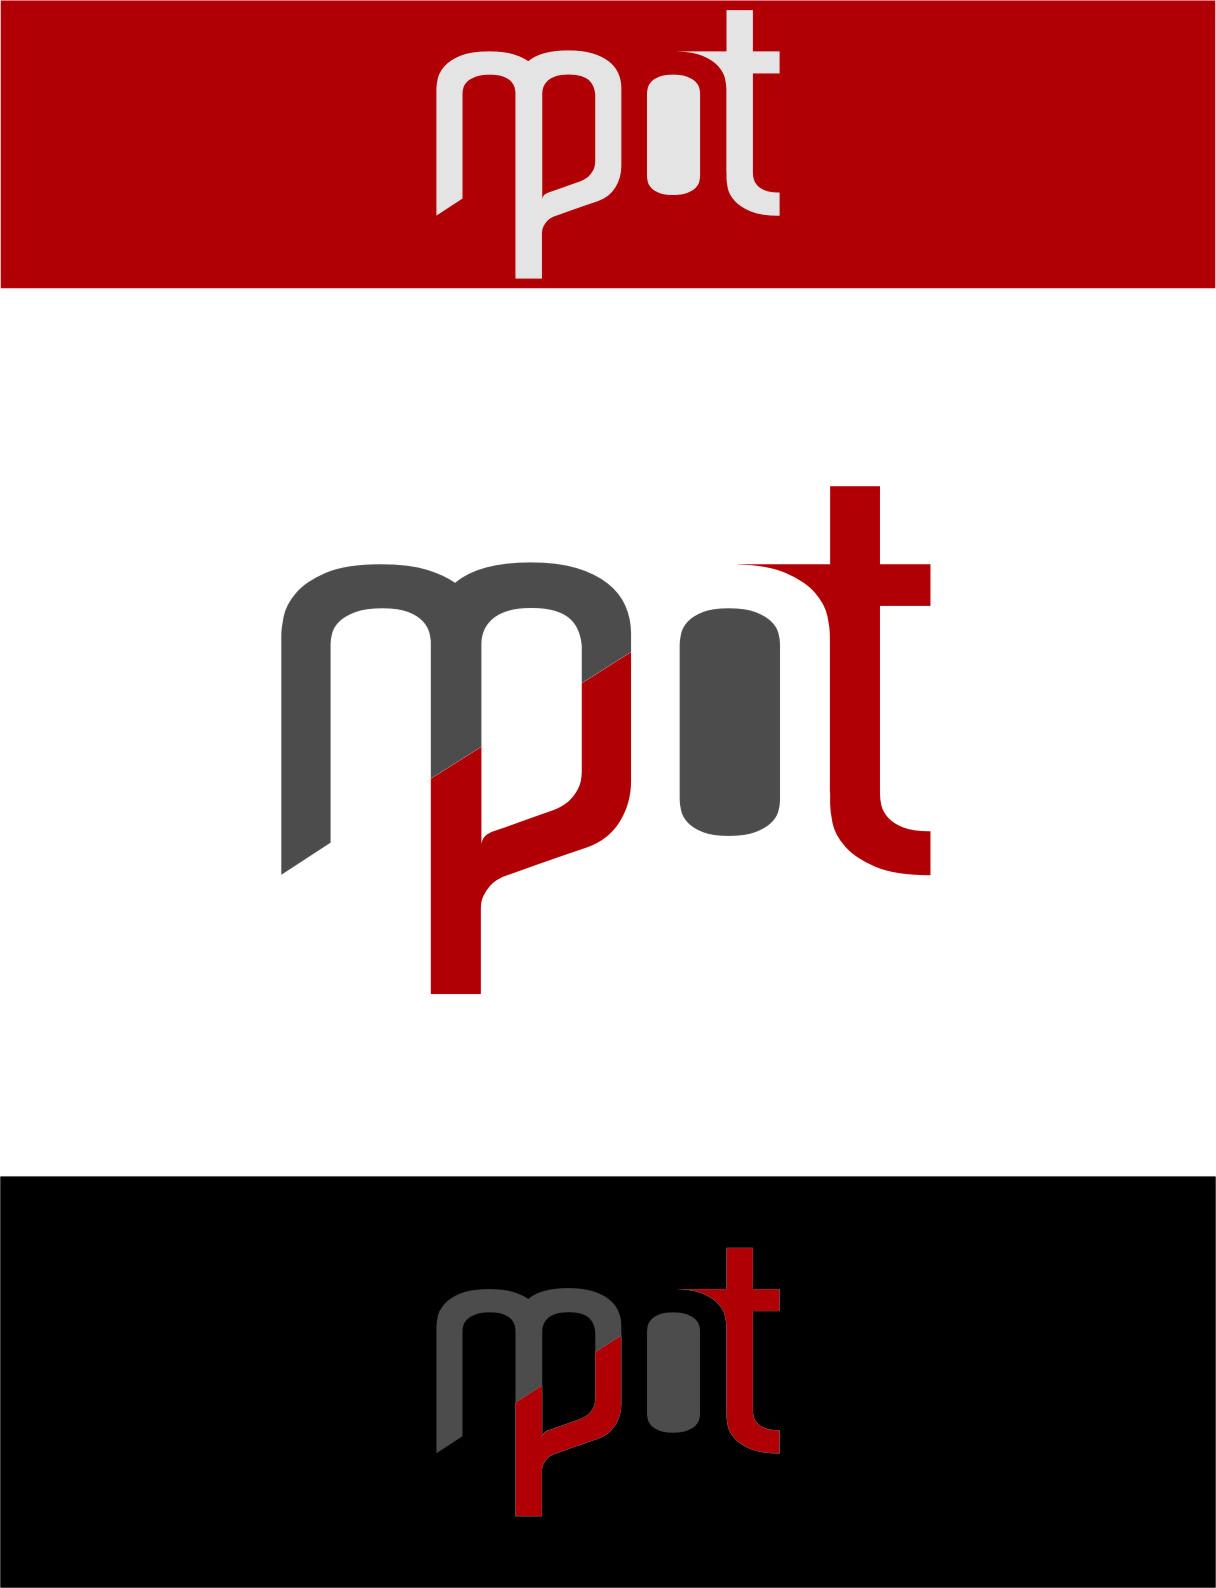 Logo Design by Ngepet_art - Entry No. 33 in the Logo Design Contest Mpot inc  Logo Design.